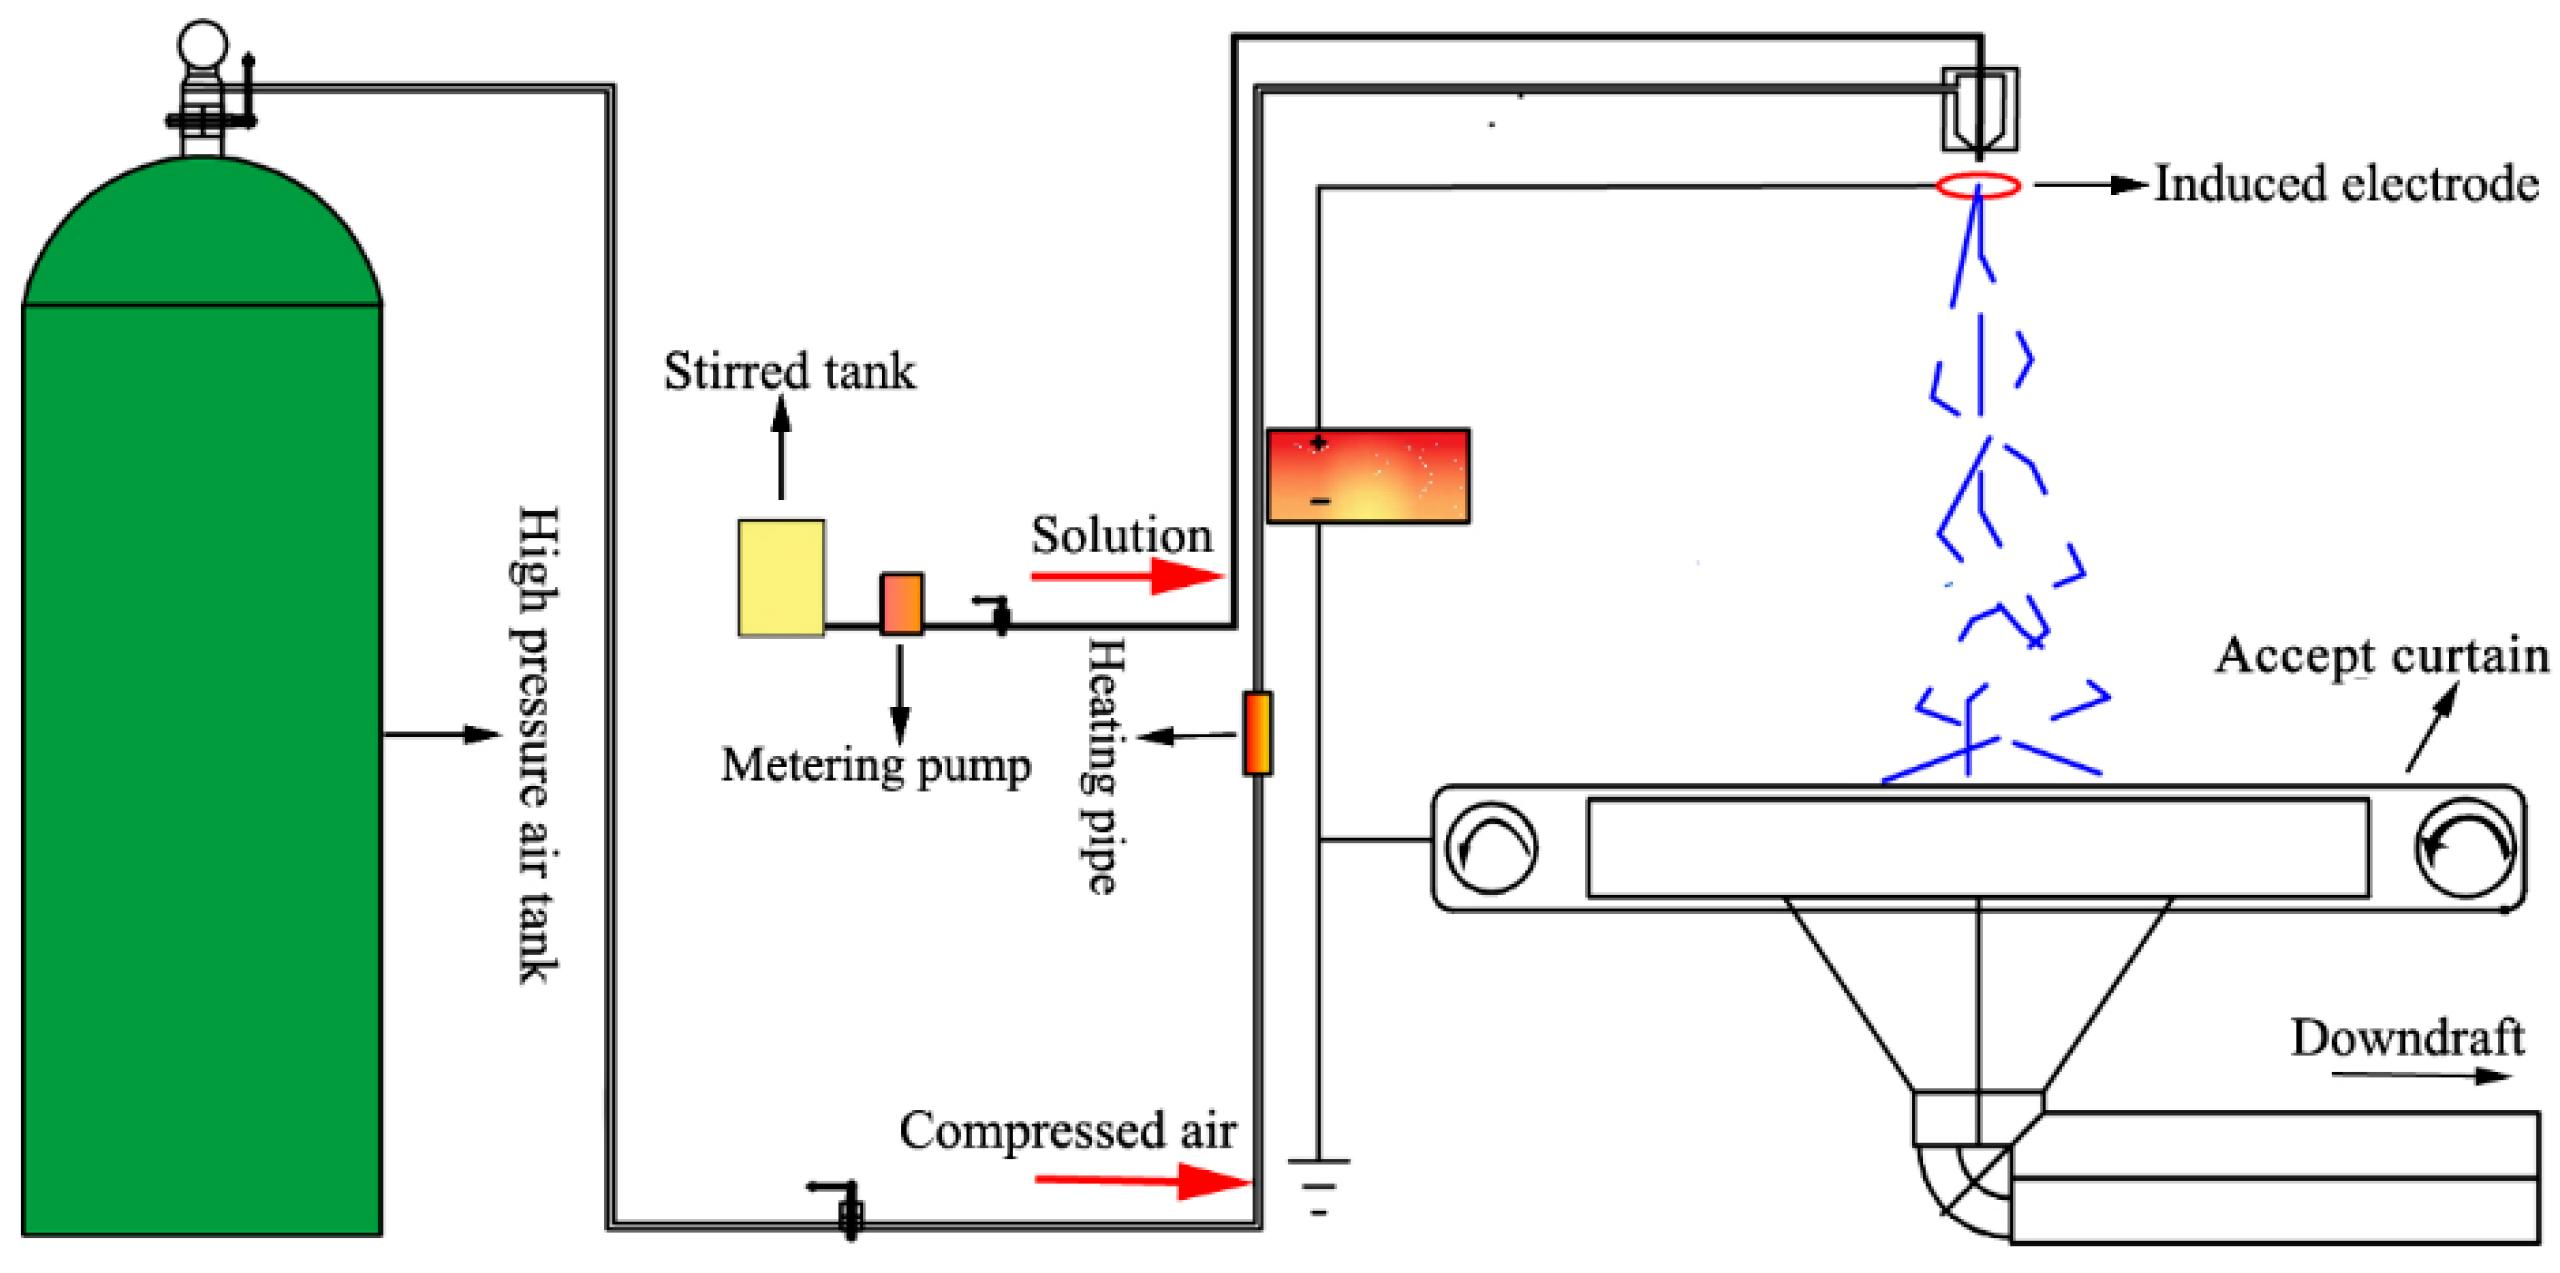 pla schematic circuit diagram custom wiring diagram u2022 rh littlewaves co